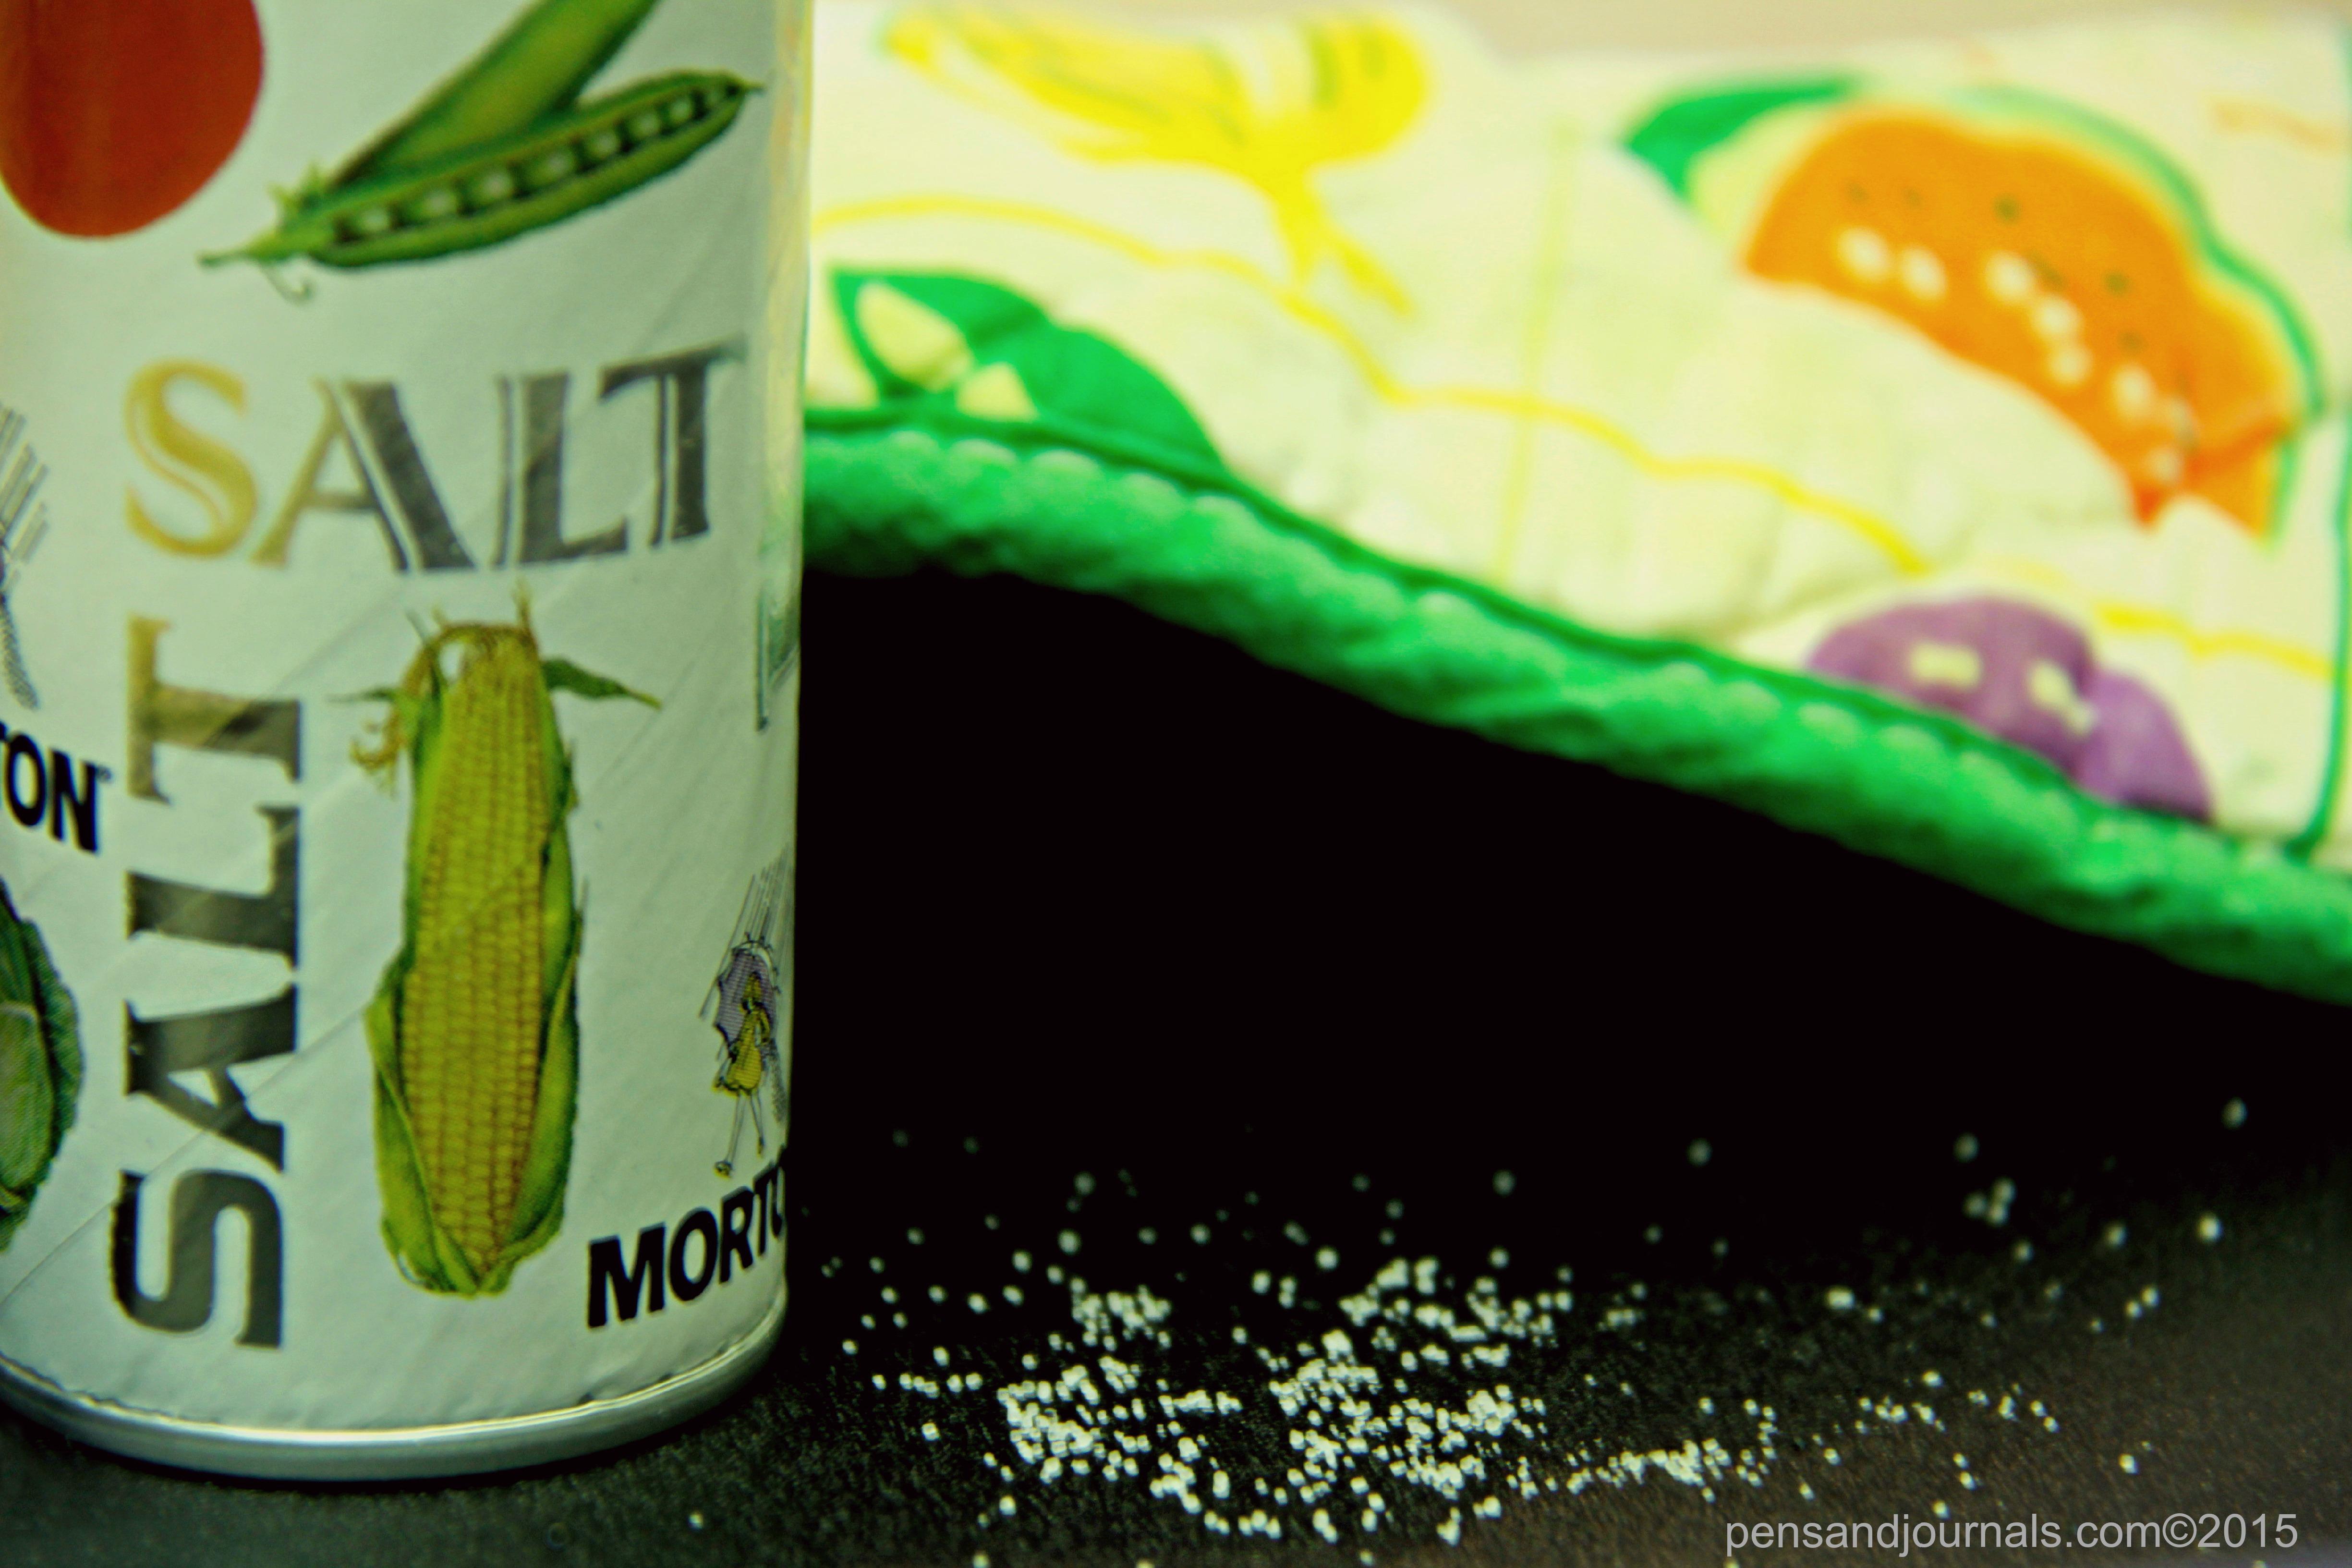 salt 2wdp - Copy